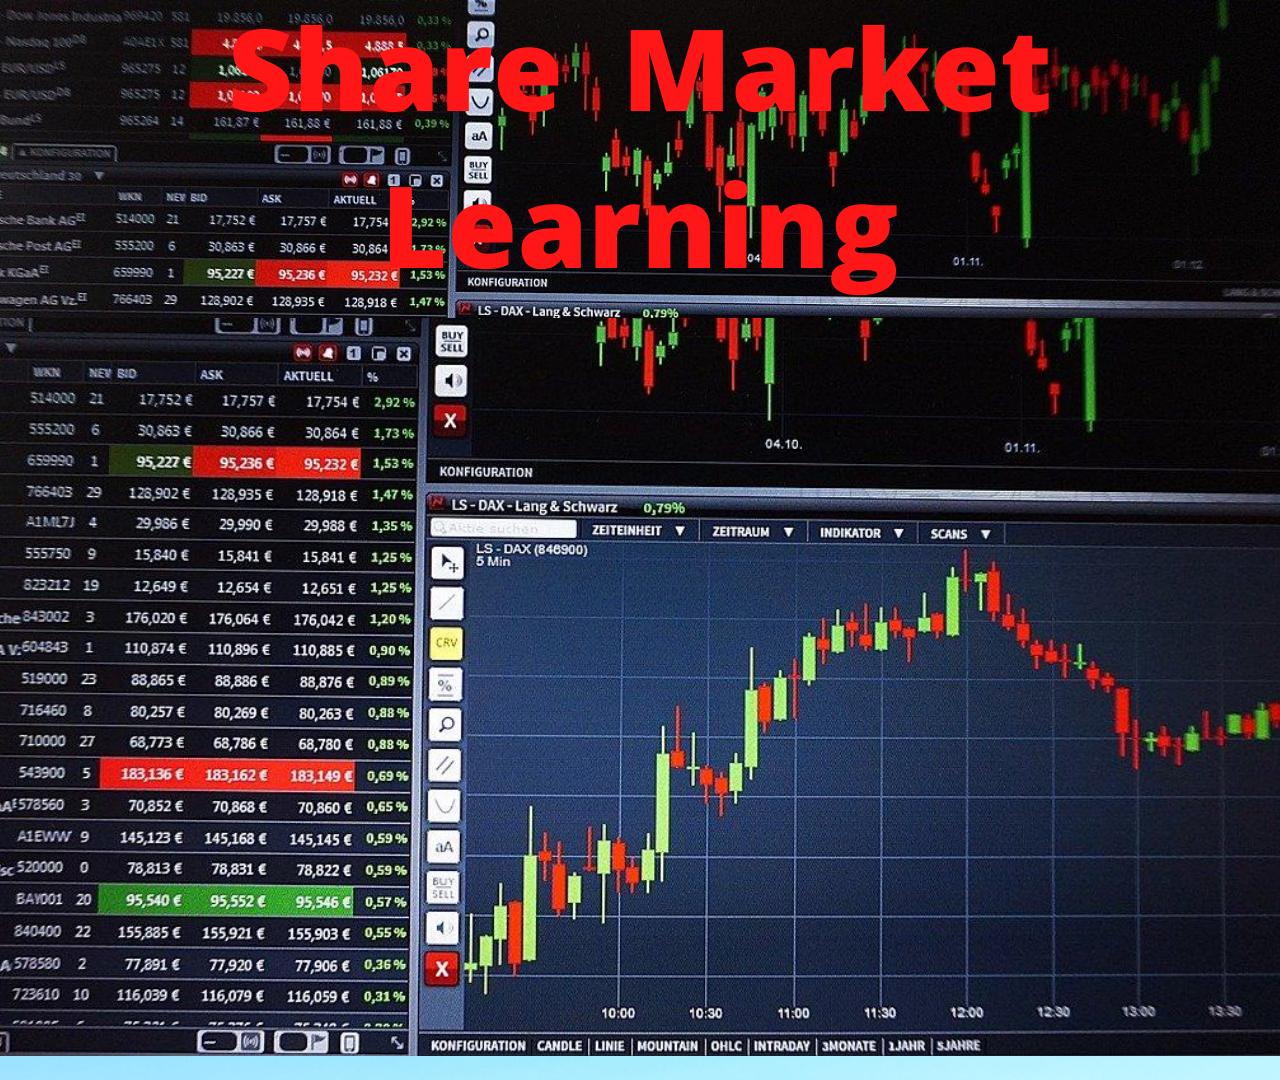 Share Market Basics & fundamentals Beginners guide for